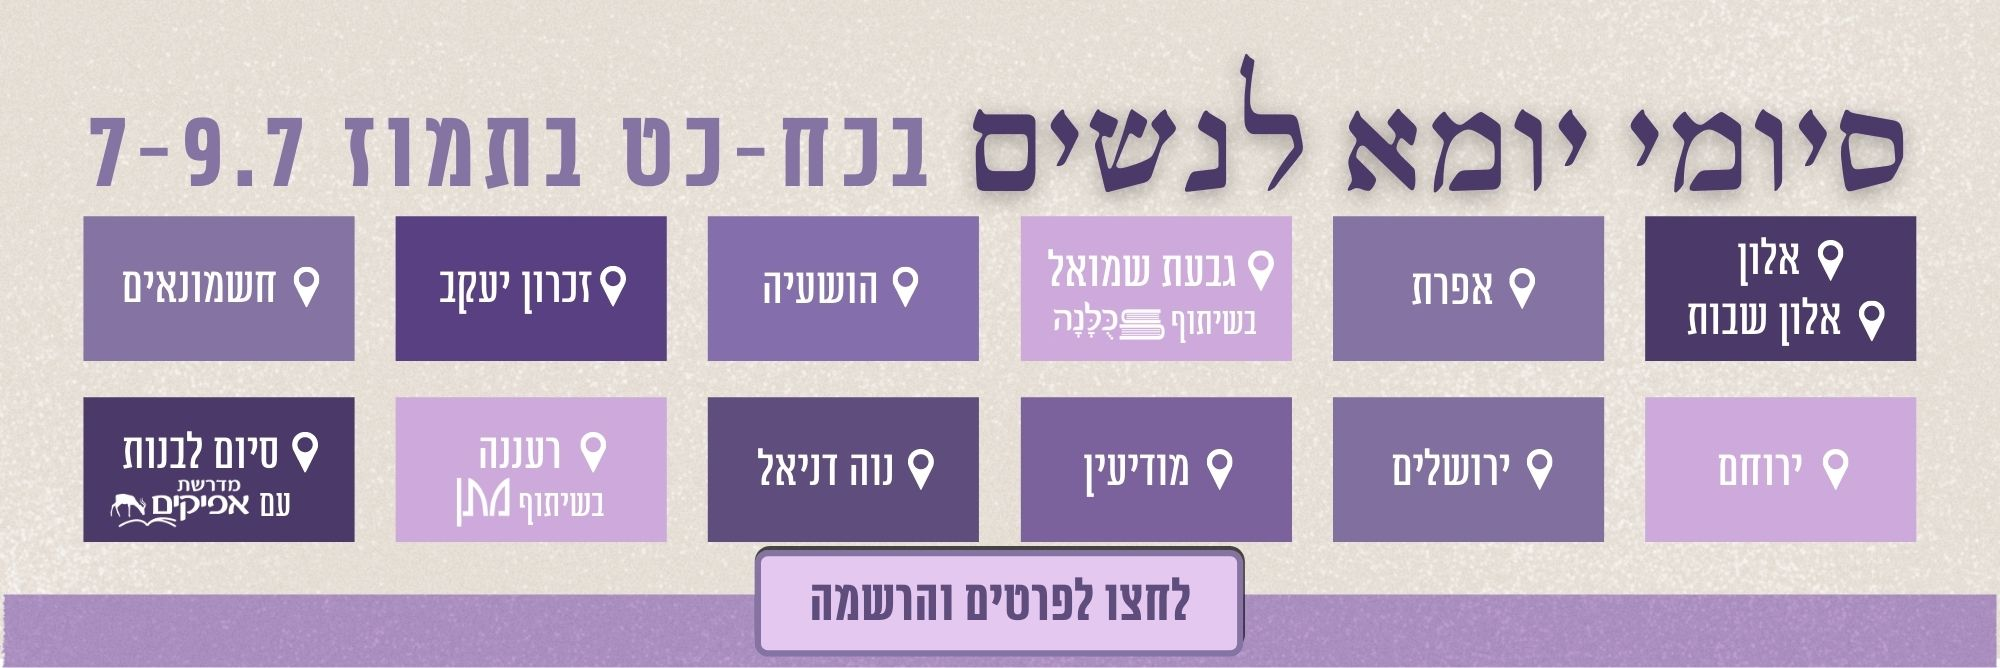 yoma invite banner web he 1